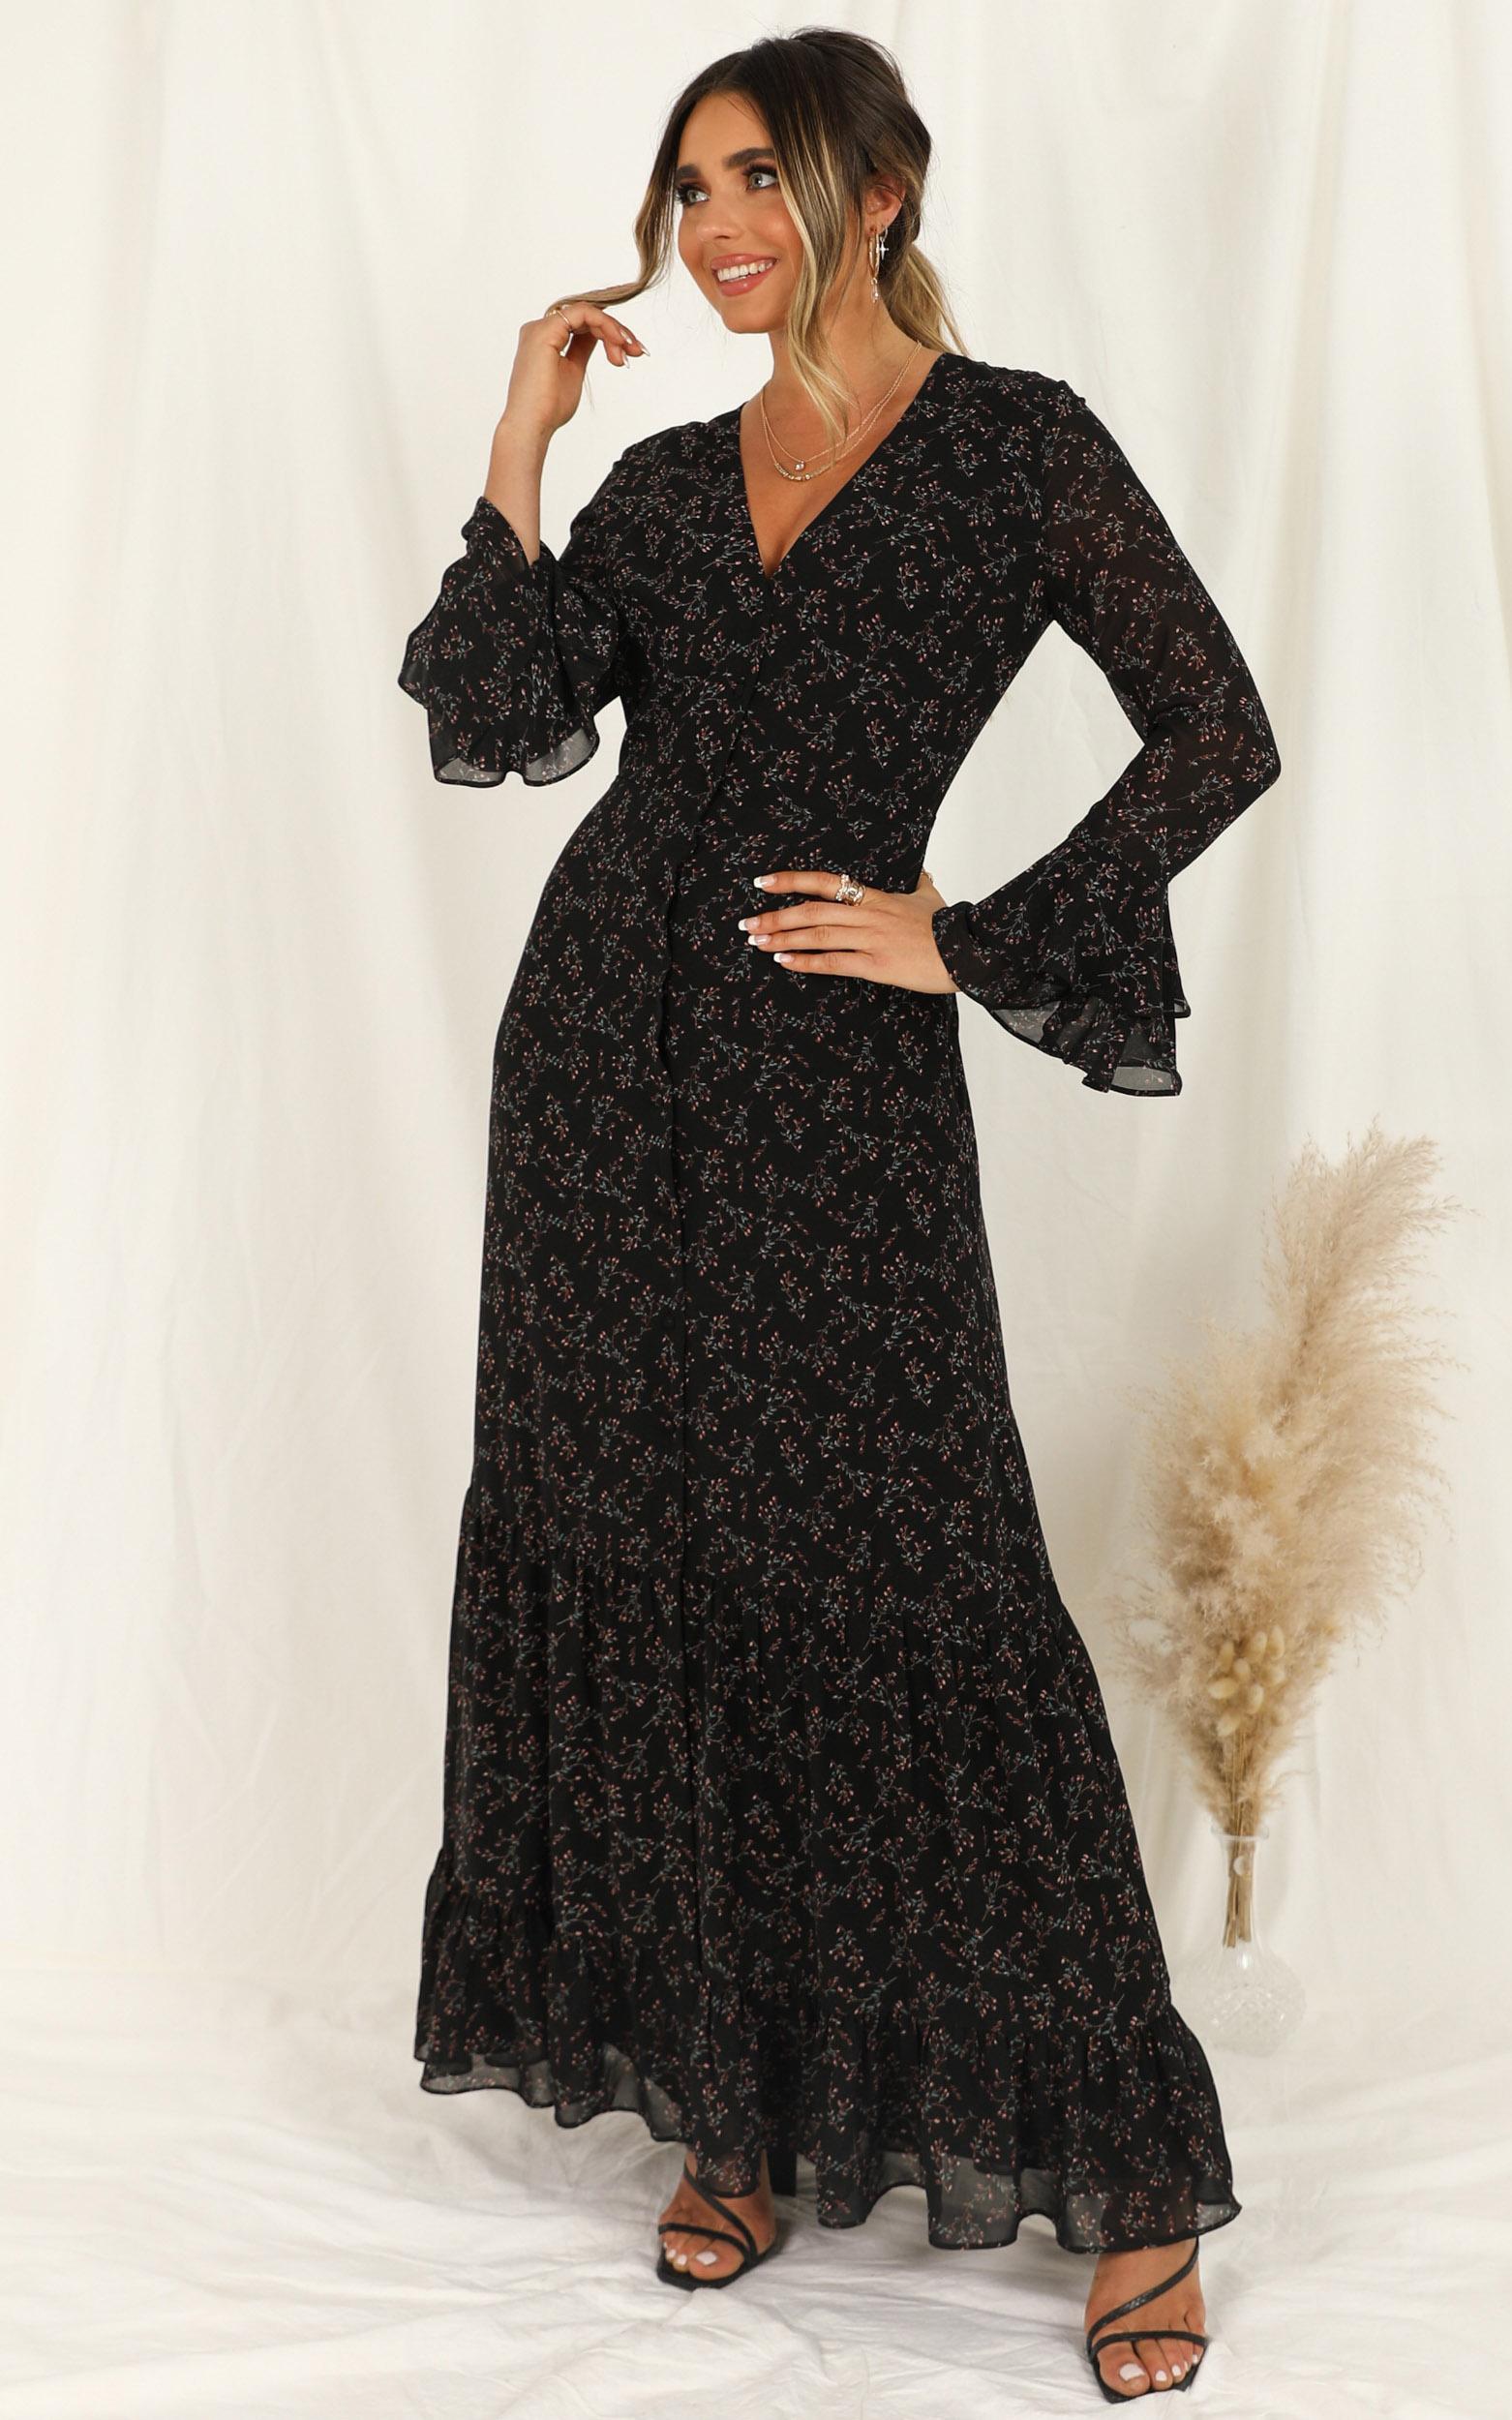 Wild Attitude Dress in black floral - 20 (XXXXL), Black, hi-res image number null